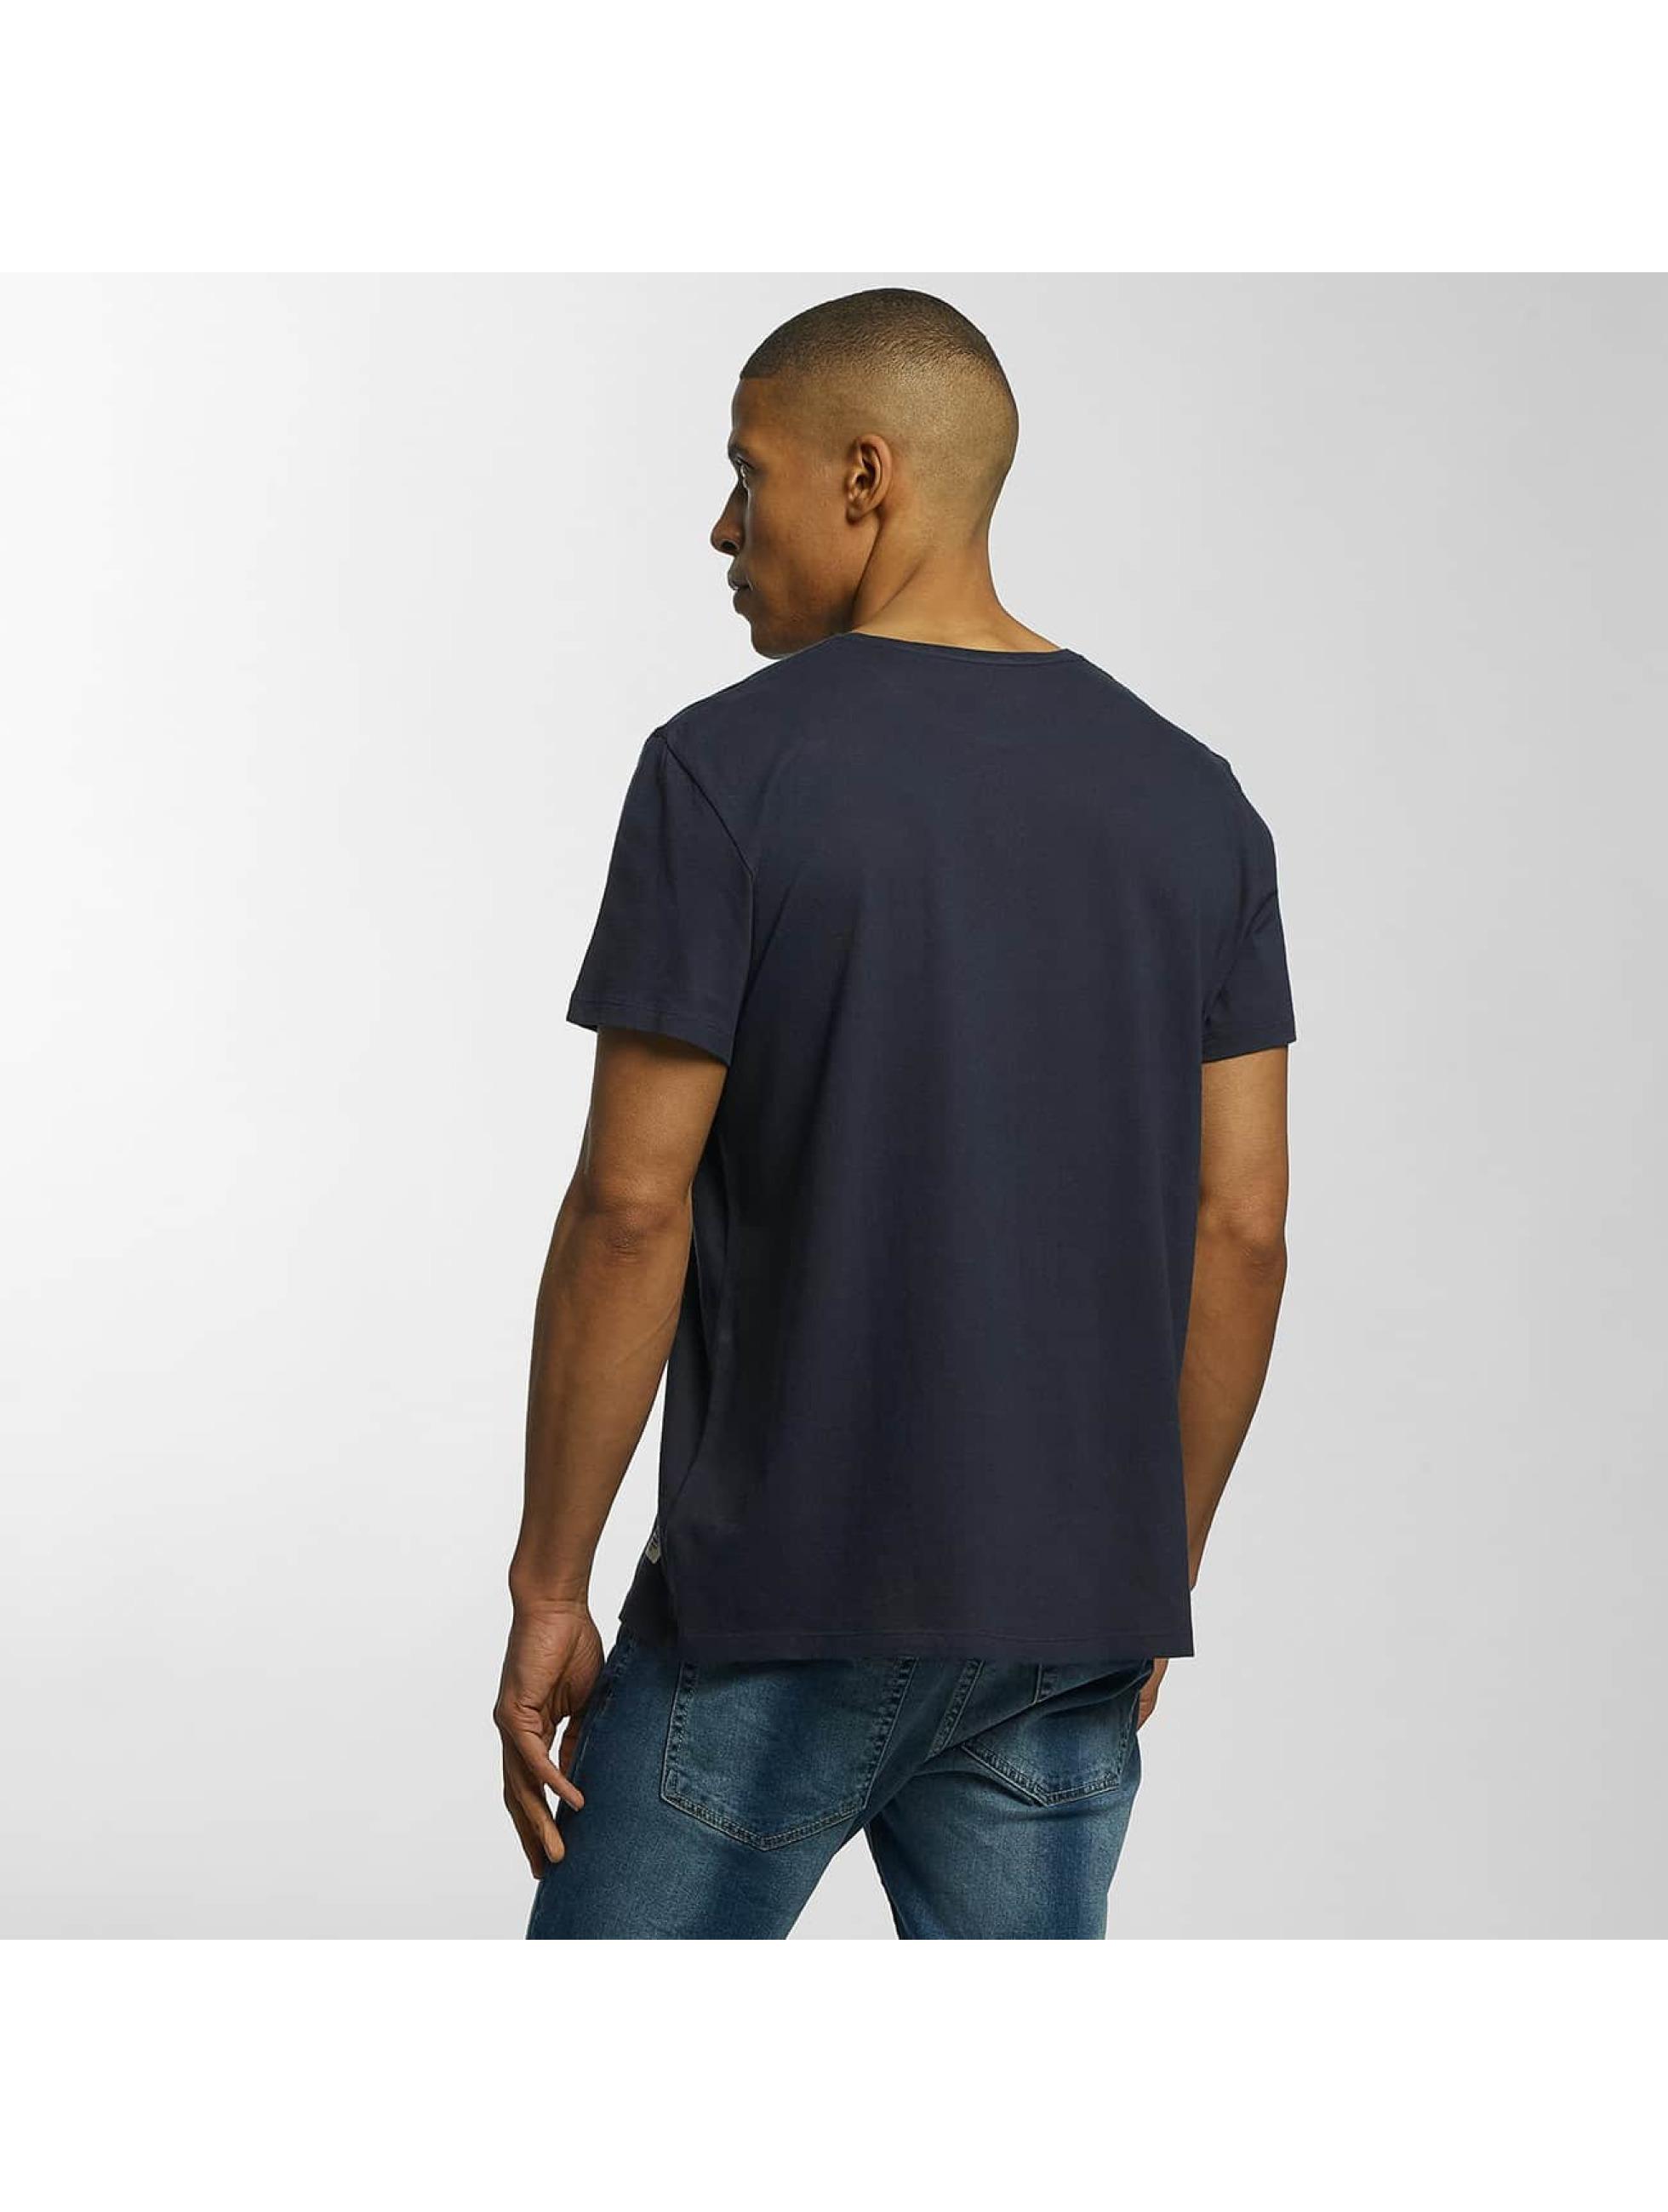 Timberland T-shirt Big Logo grigio